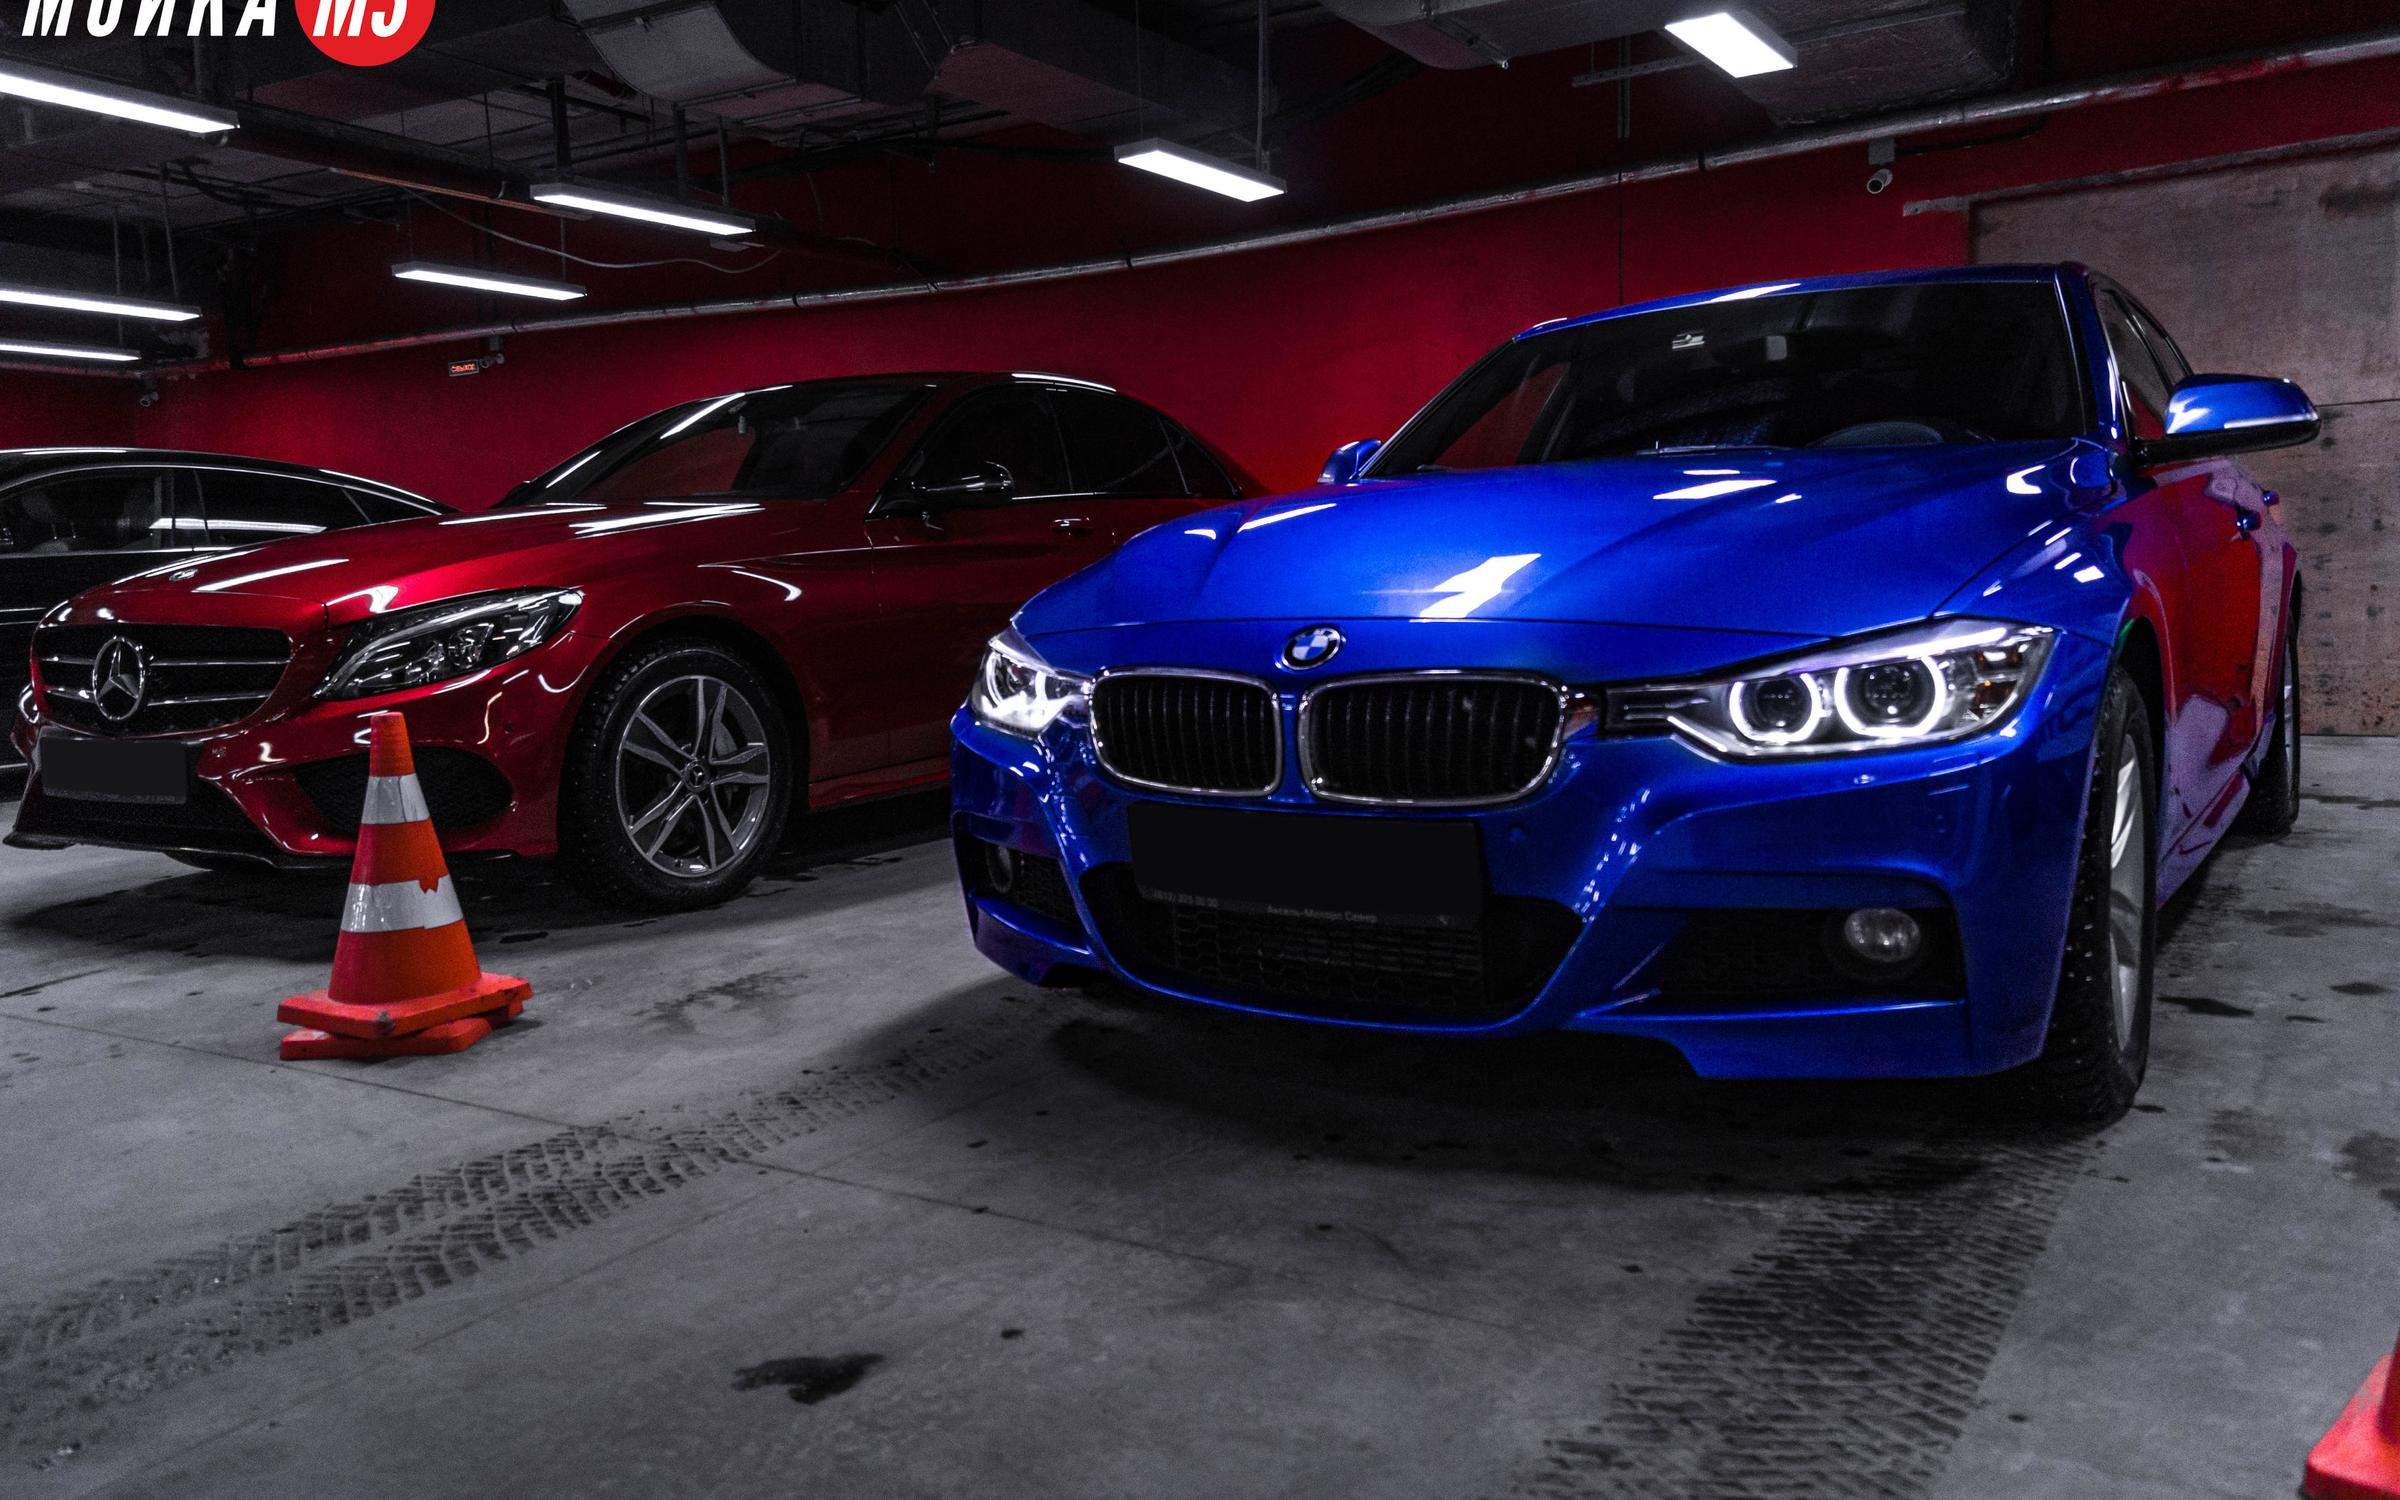 фотография Автомойки Мойка М3 в ТЦ Питерлэнд